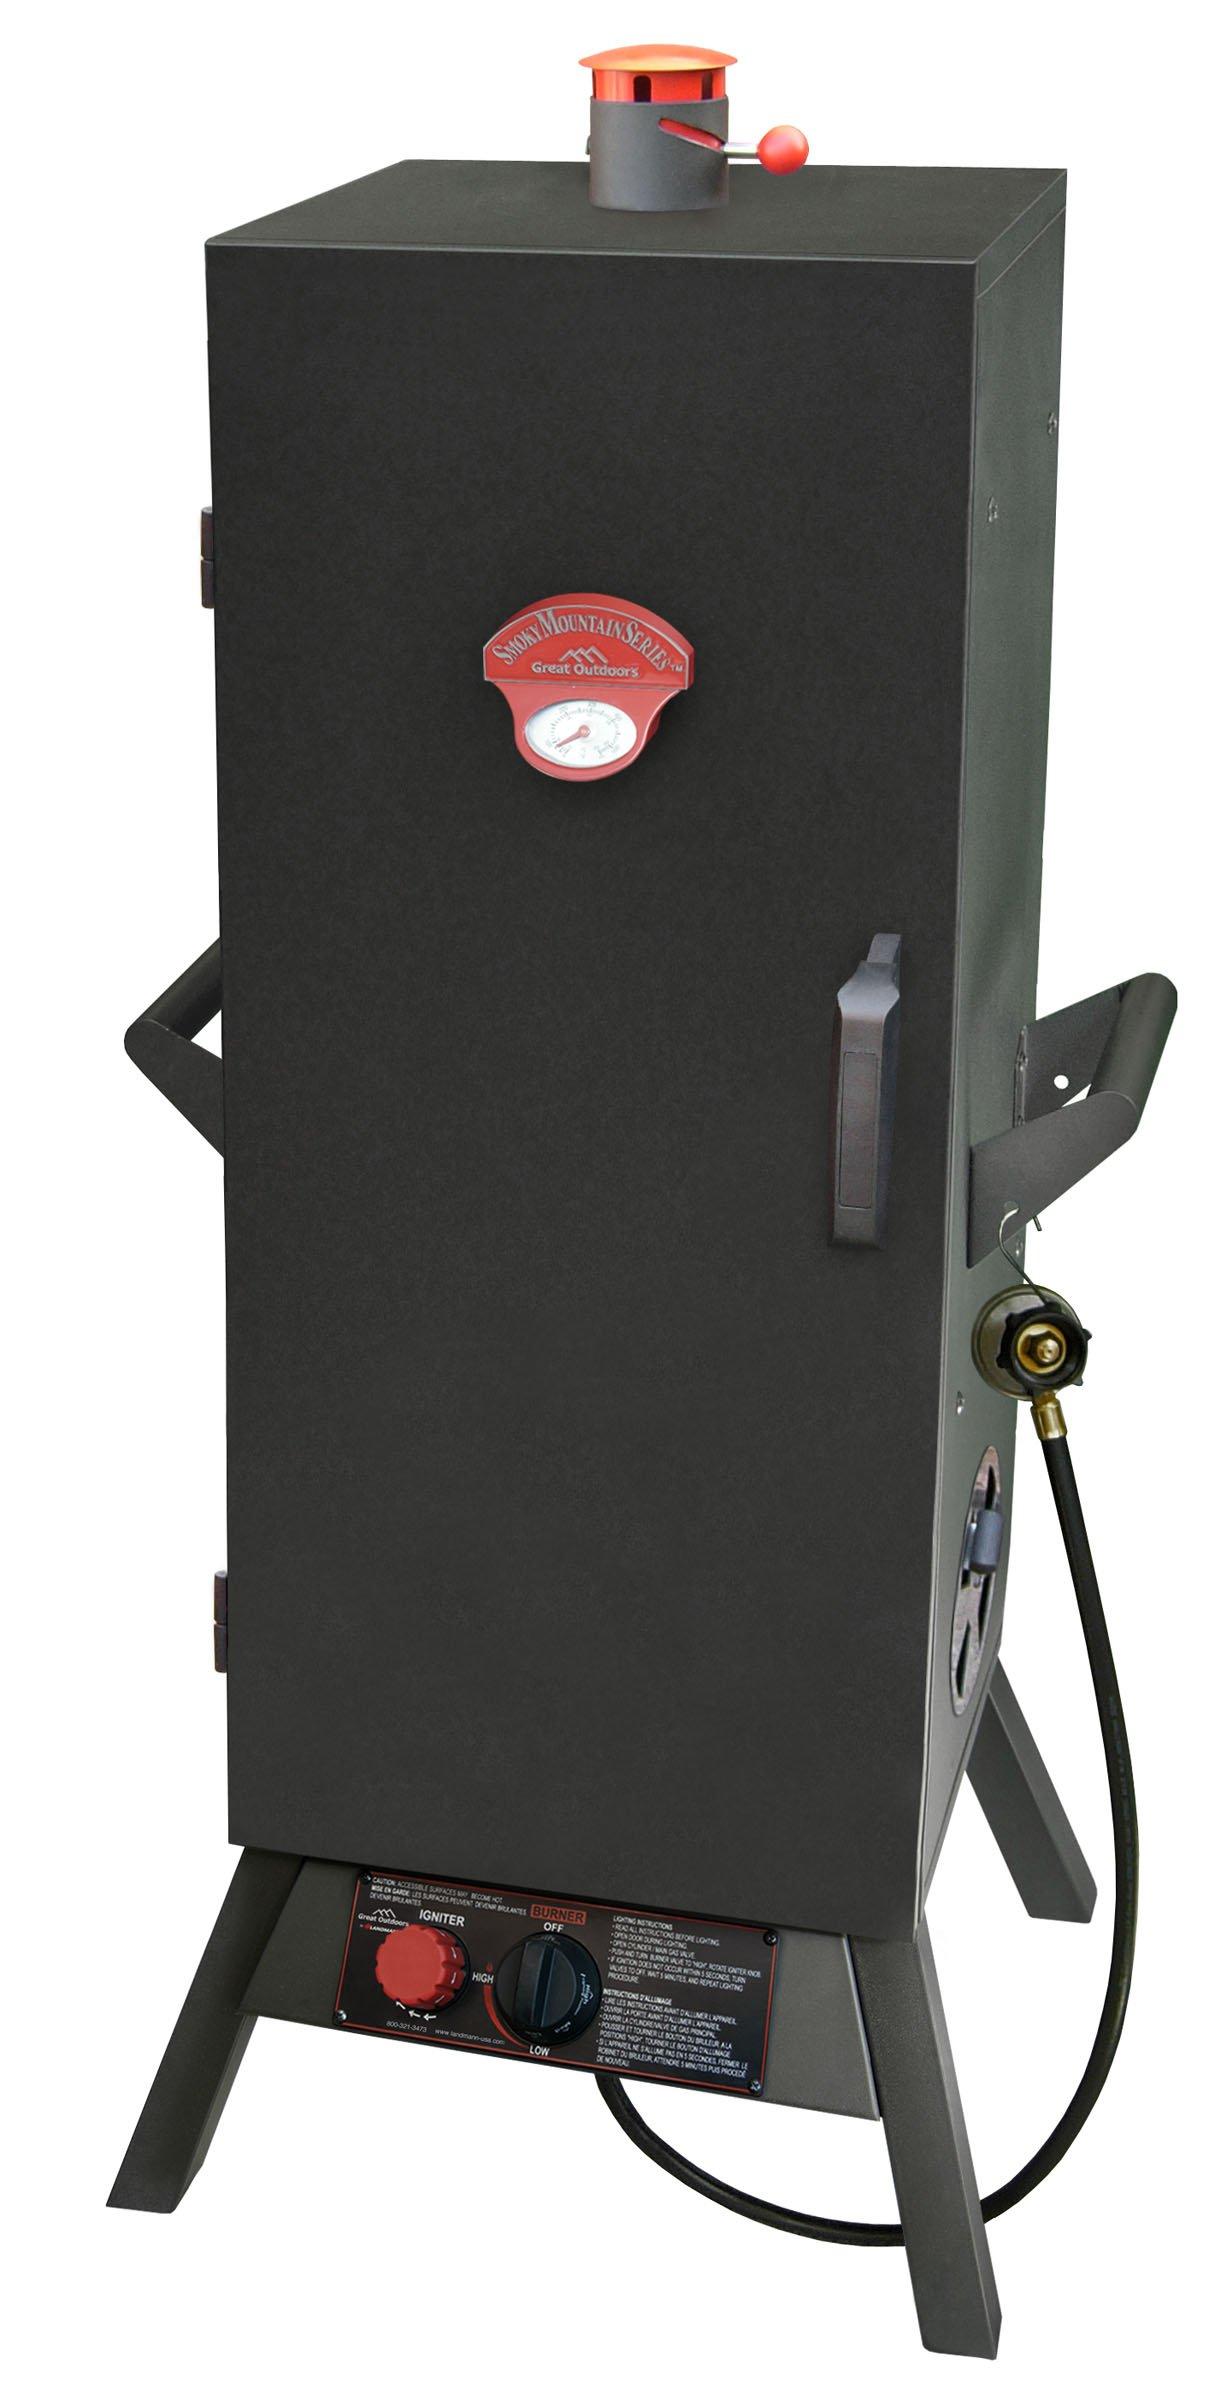 Landmann USA 3695GD Smoky Mountain Vertical Gas Smoker, 36-Inch